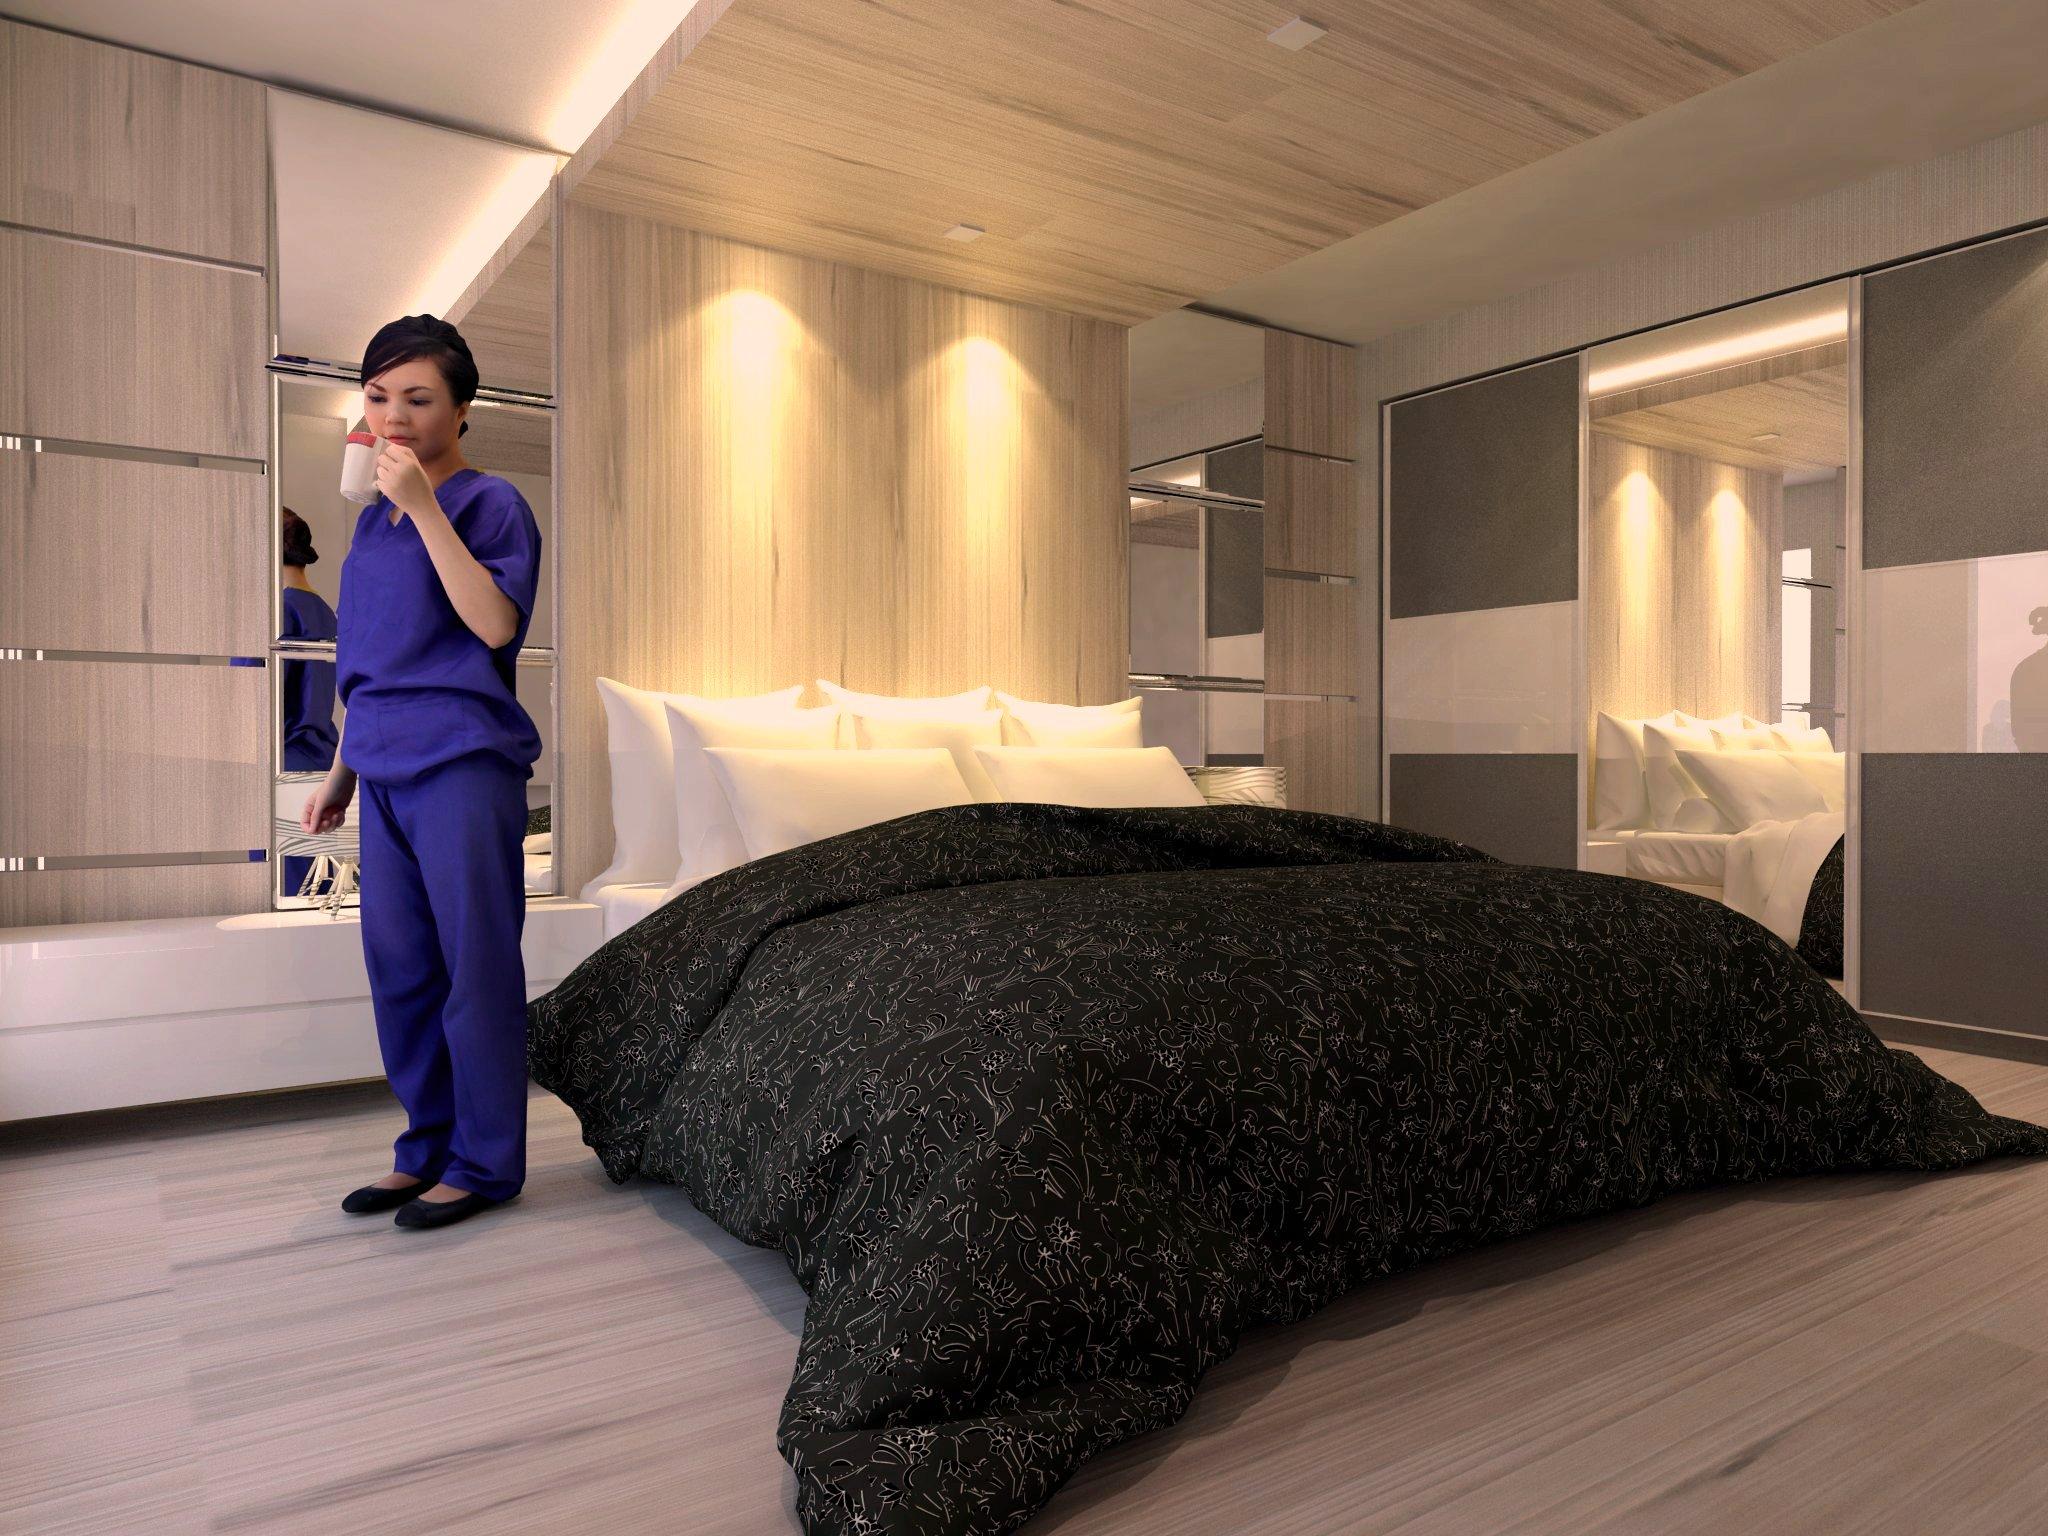 bedroom set interior design di roa malaka, jakarta barat